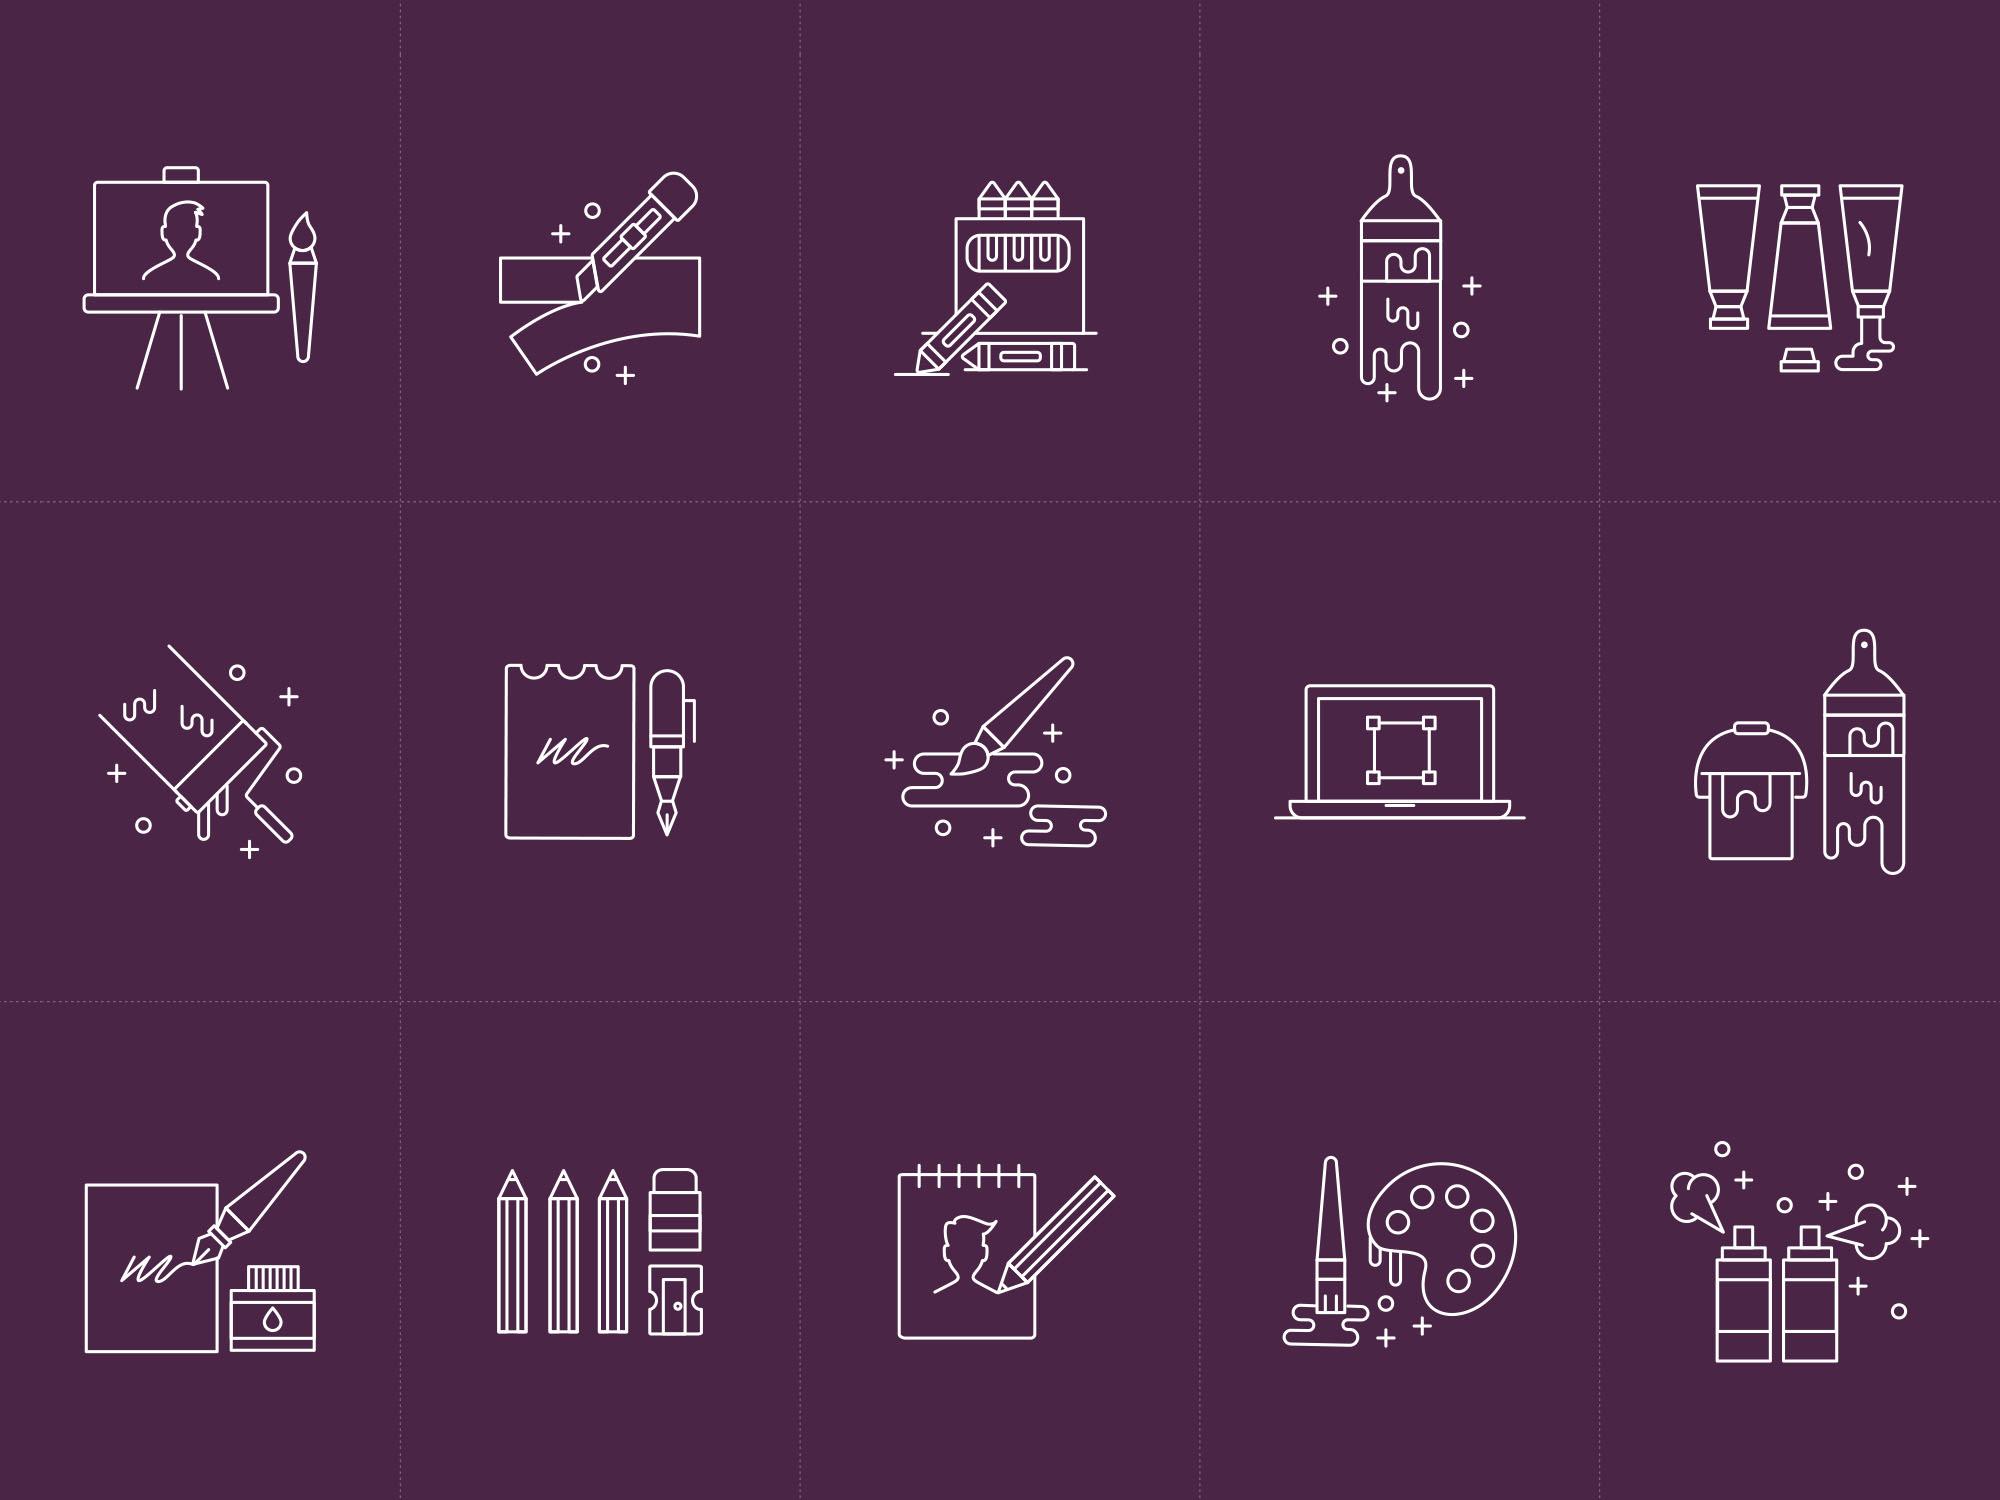 Design & Art Tools Icons 2